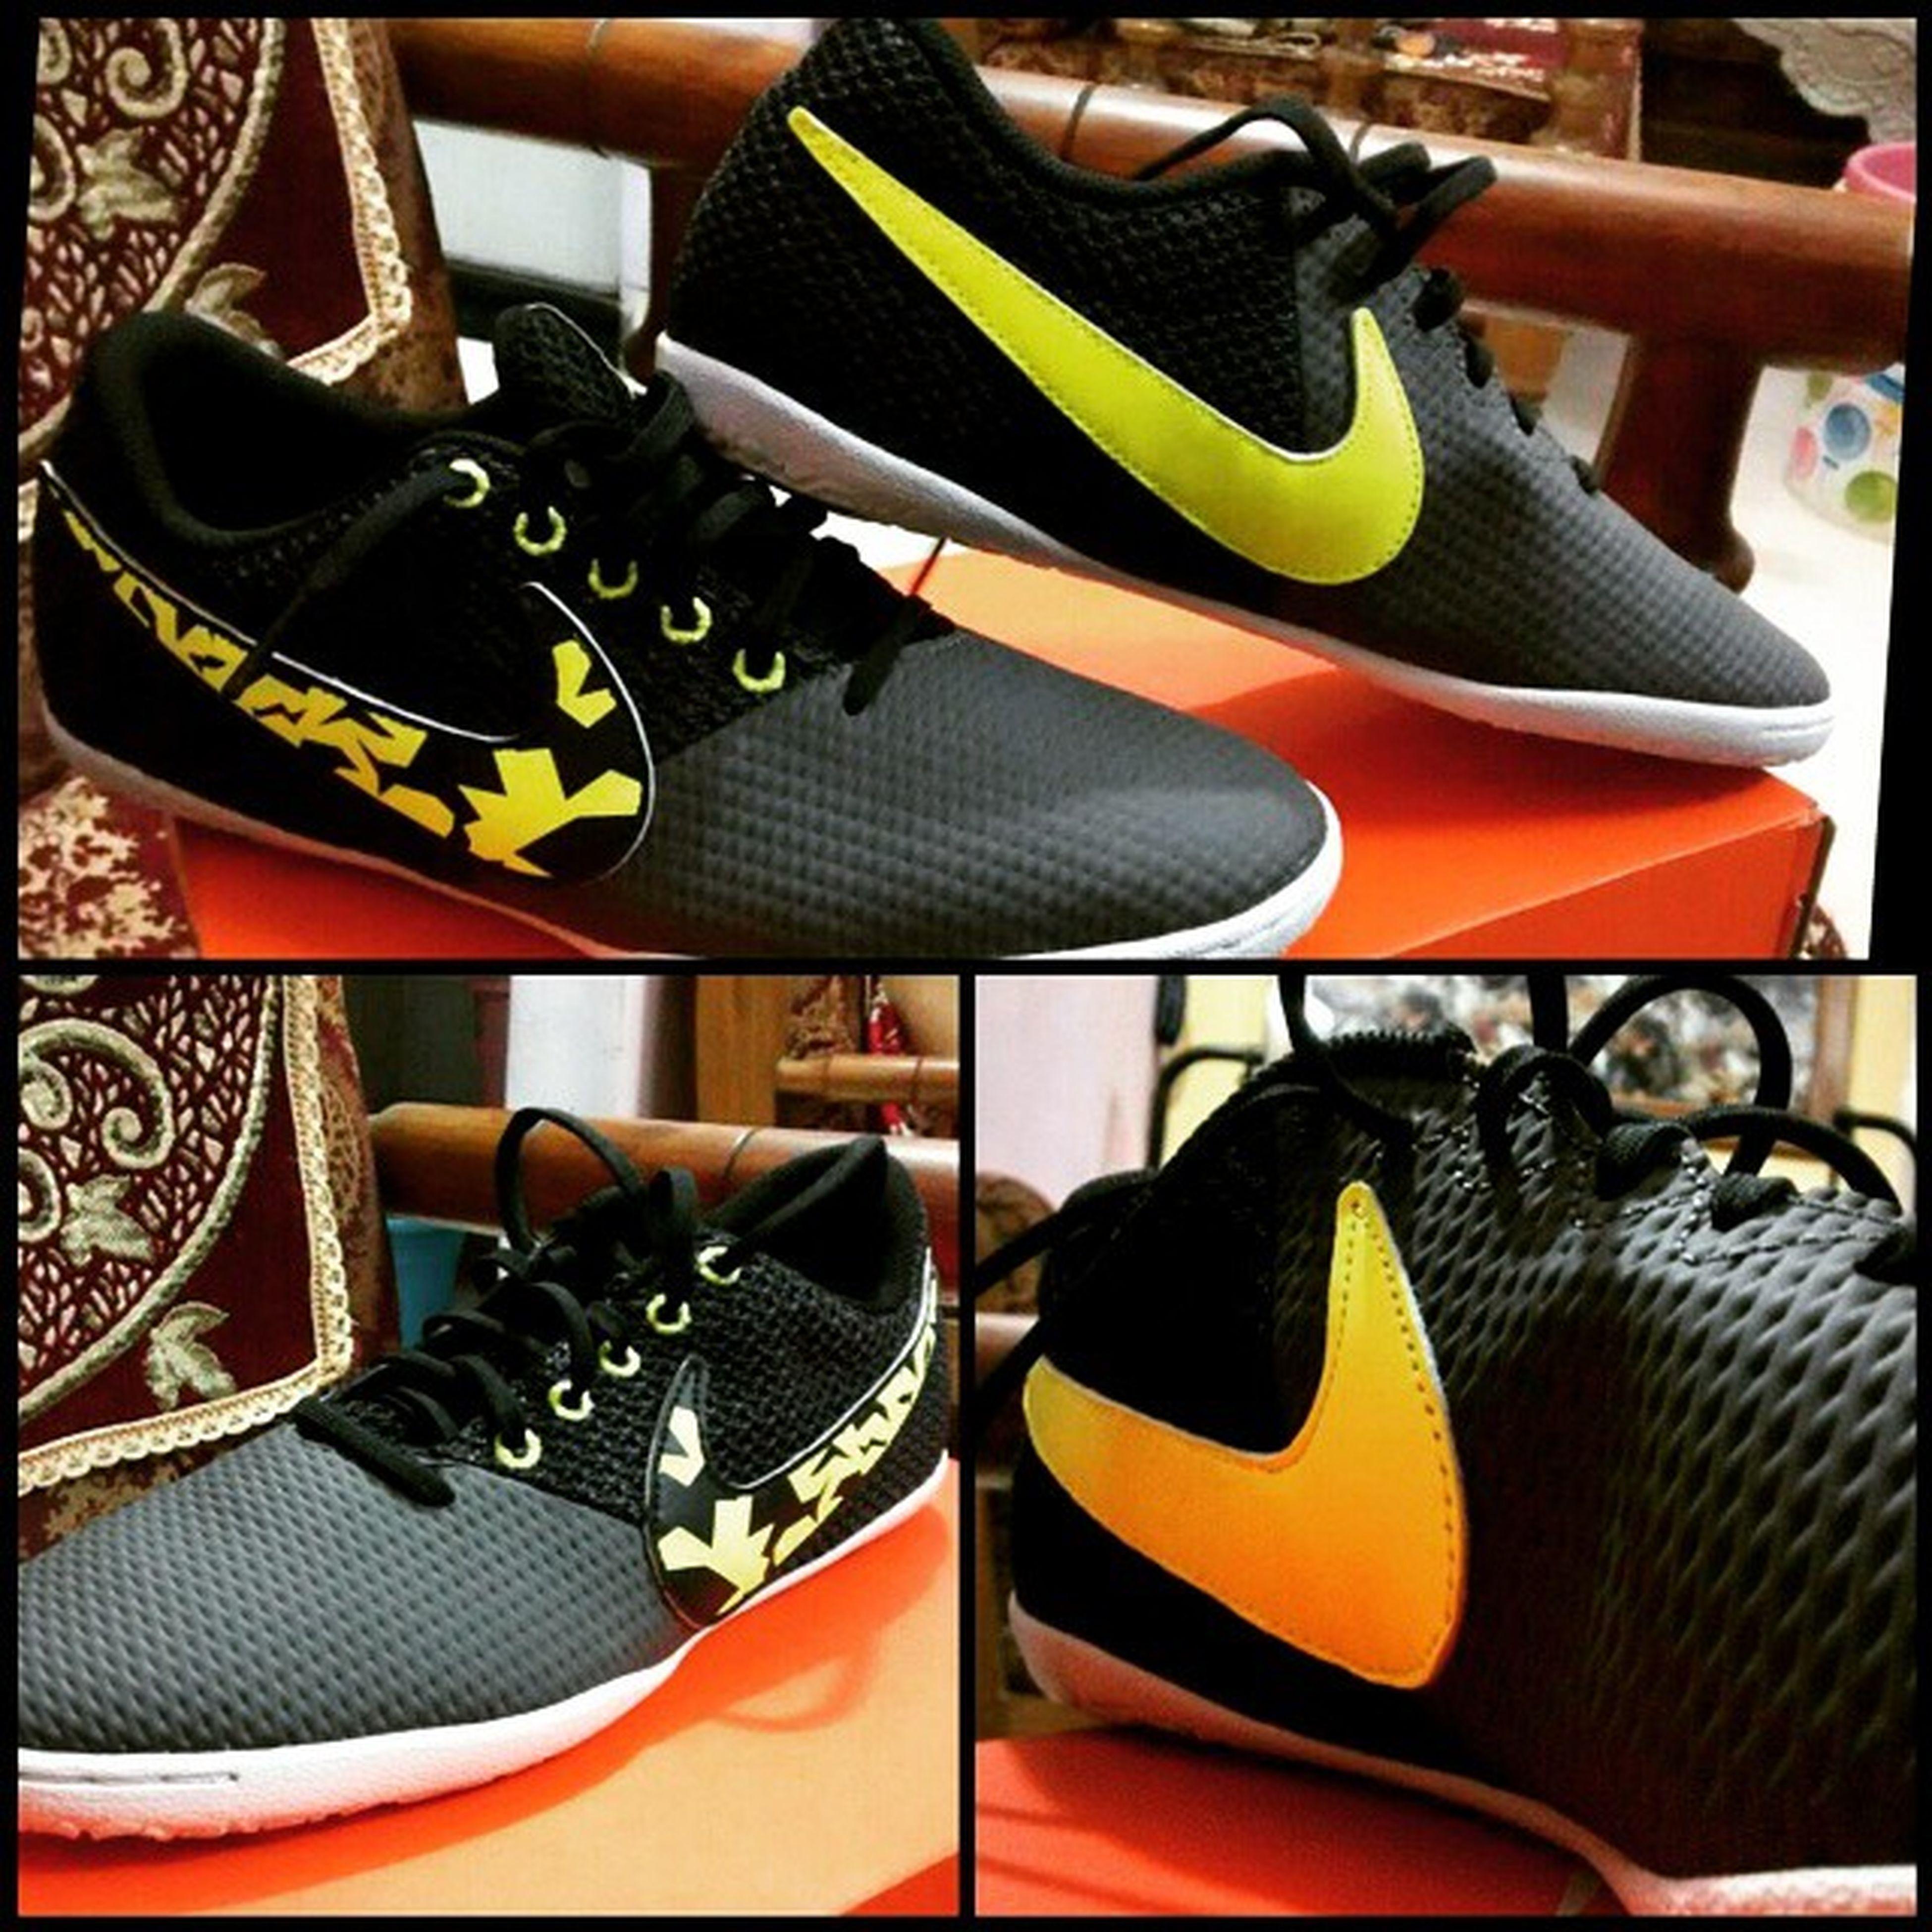 My New.. Nike Elastico Pro iii IC 😍😏 Nike Nikefootballx Nikeealstico ElasticoproIII Nikefutsal Niketurfs Nikeindia Nikefootball Nikefootballsociety Nikefootballswag Ohyeah :-> Thank you @s.tasneem :) :*